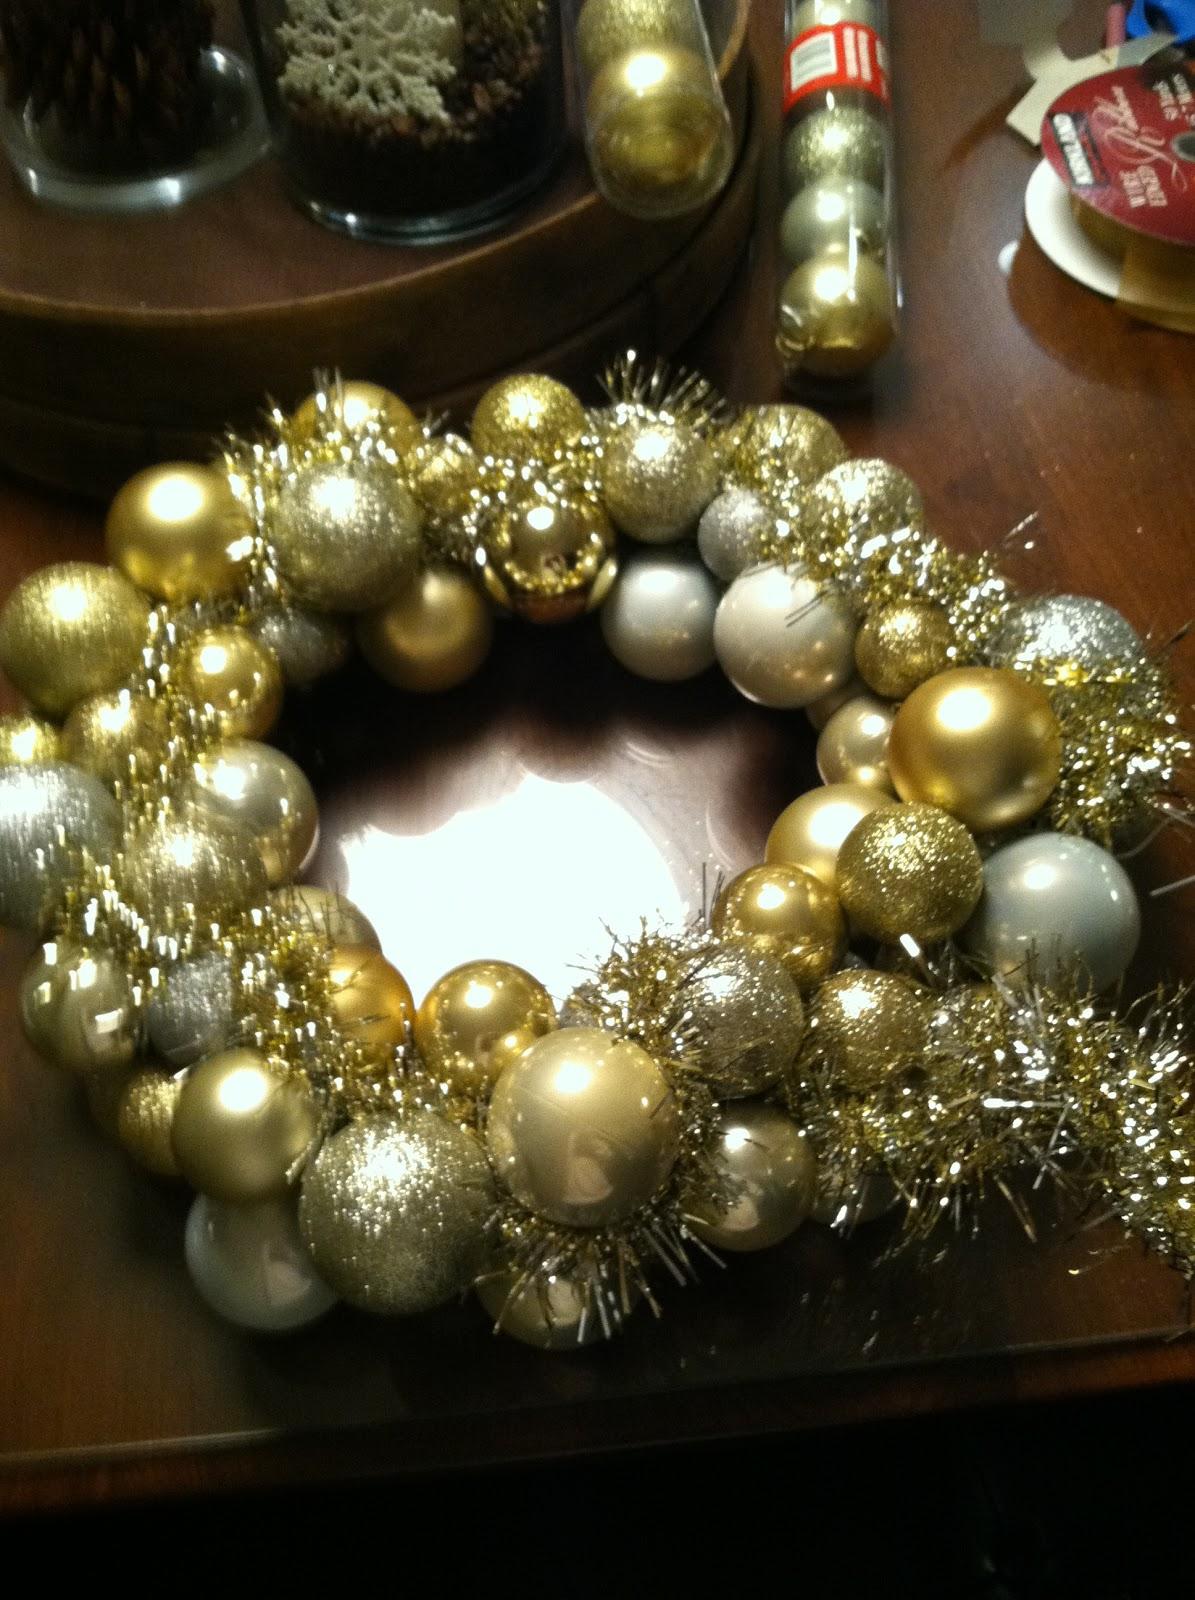 Tinsel Filler For Christmas Wreath